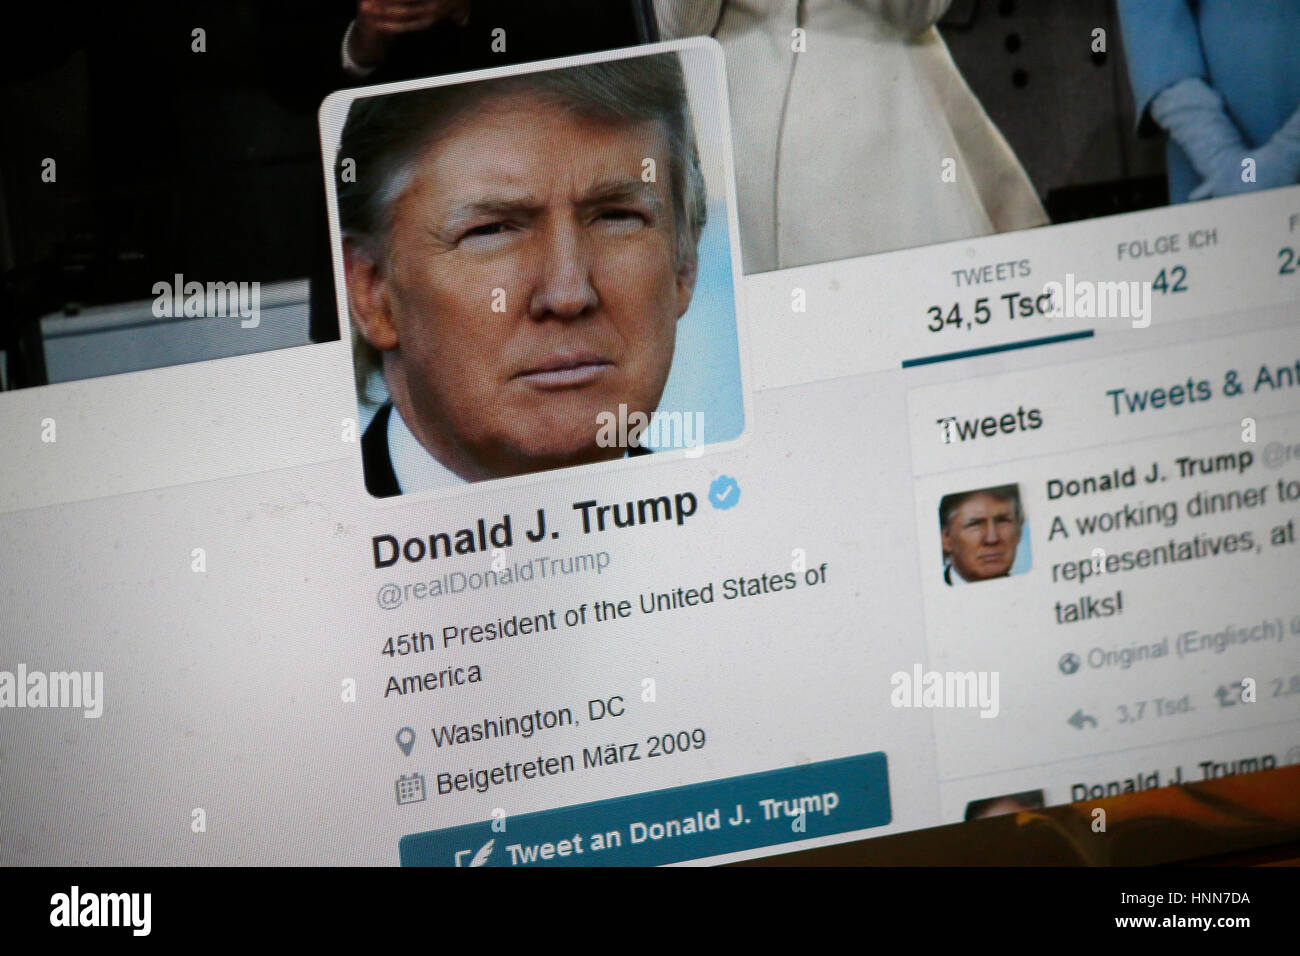 das Twitter Account des US amerrikanischen Praesidenten Donald Trump, Berlin. - Stock Image